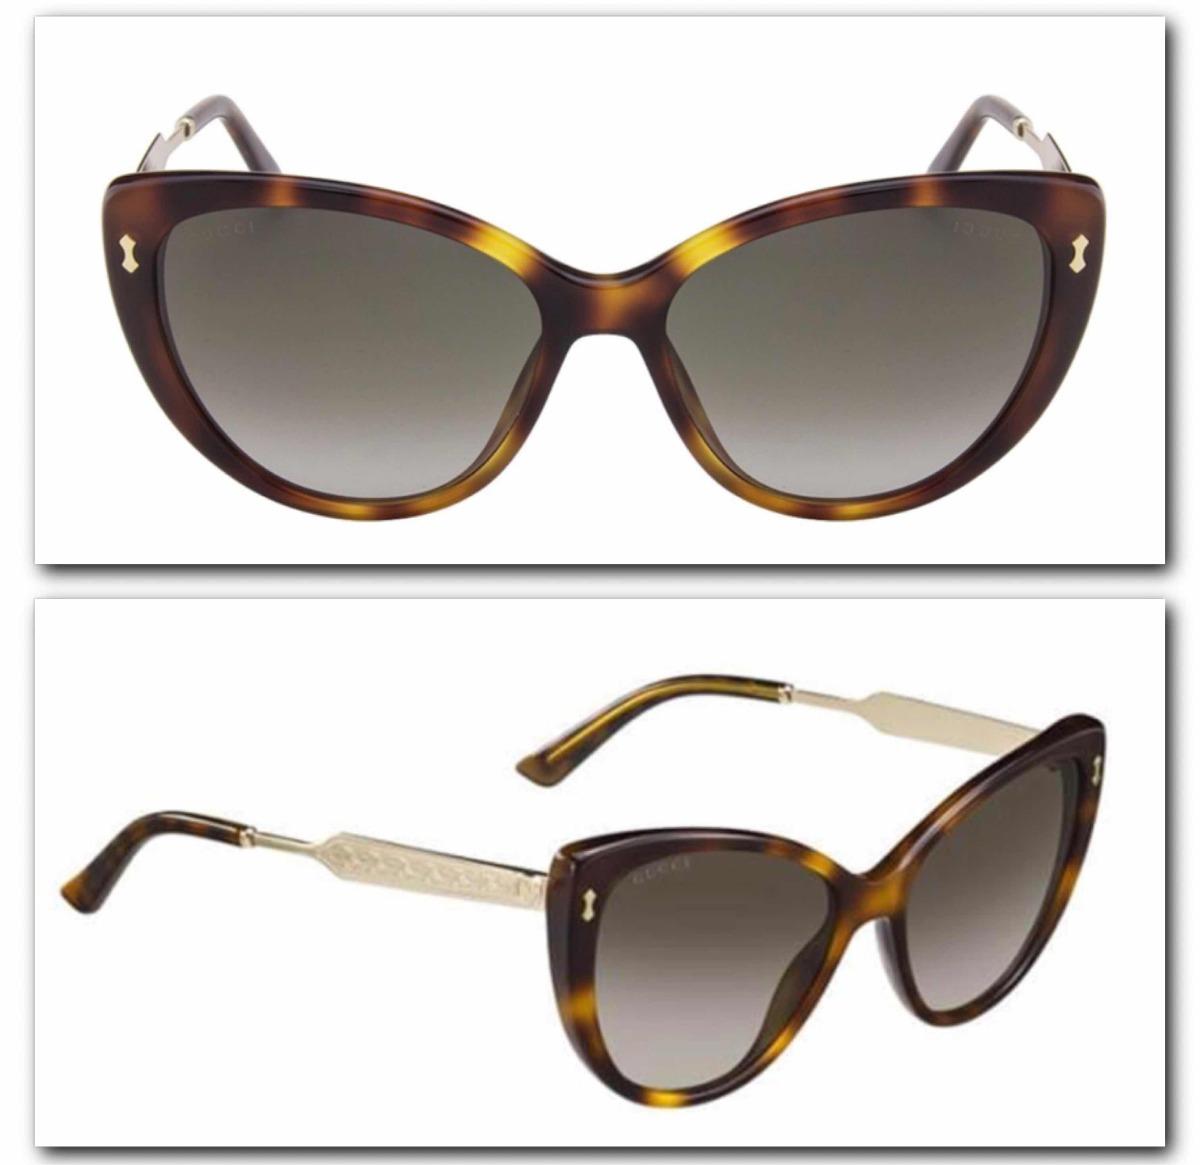 Óculos De Sol Gucci - R  1.350,00 em Mercado Livre fcd743e09b